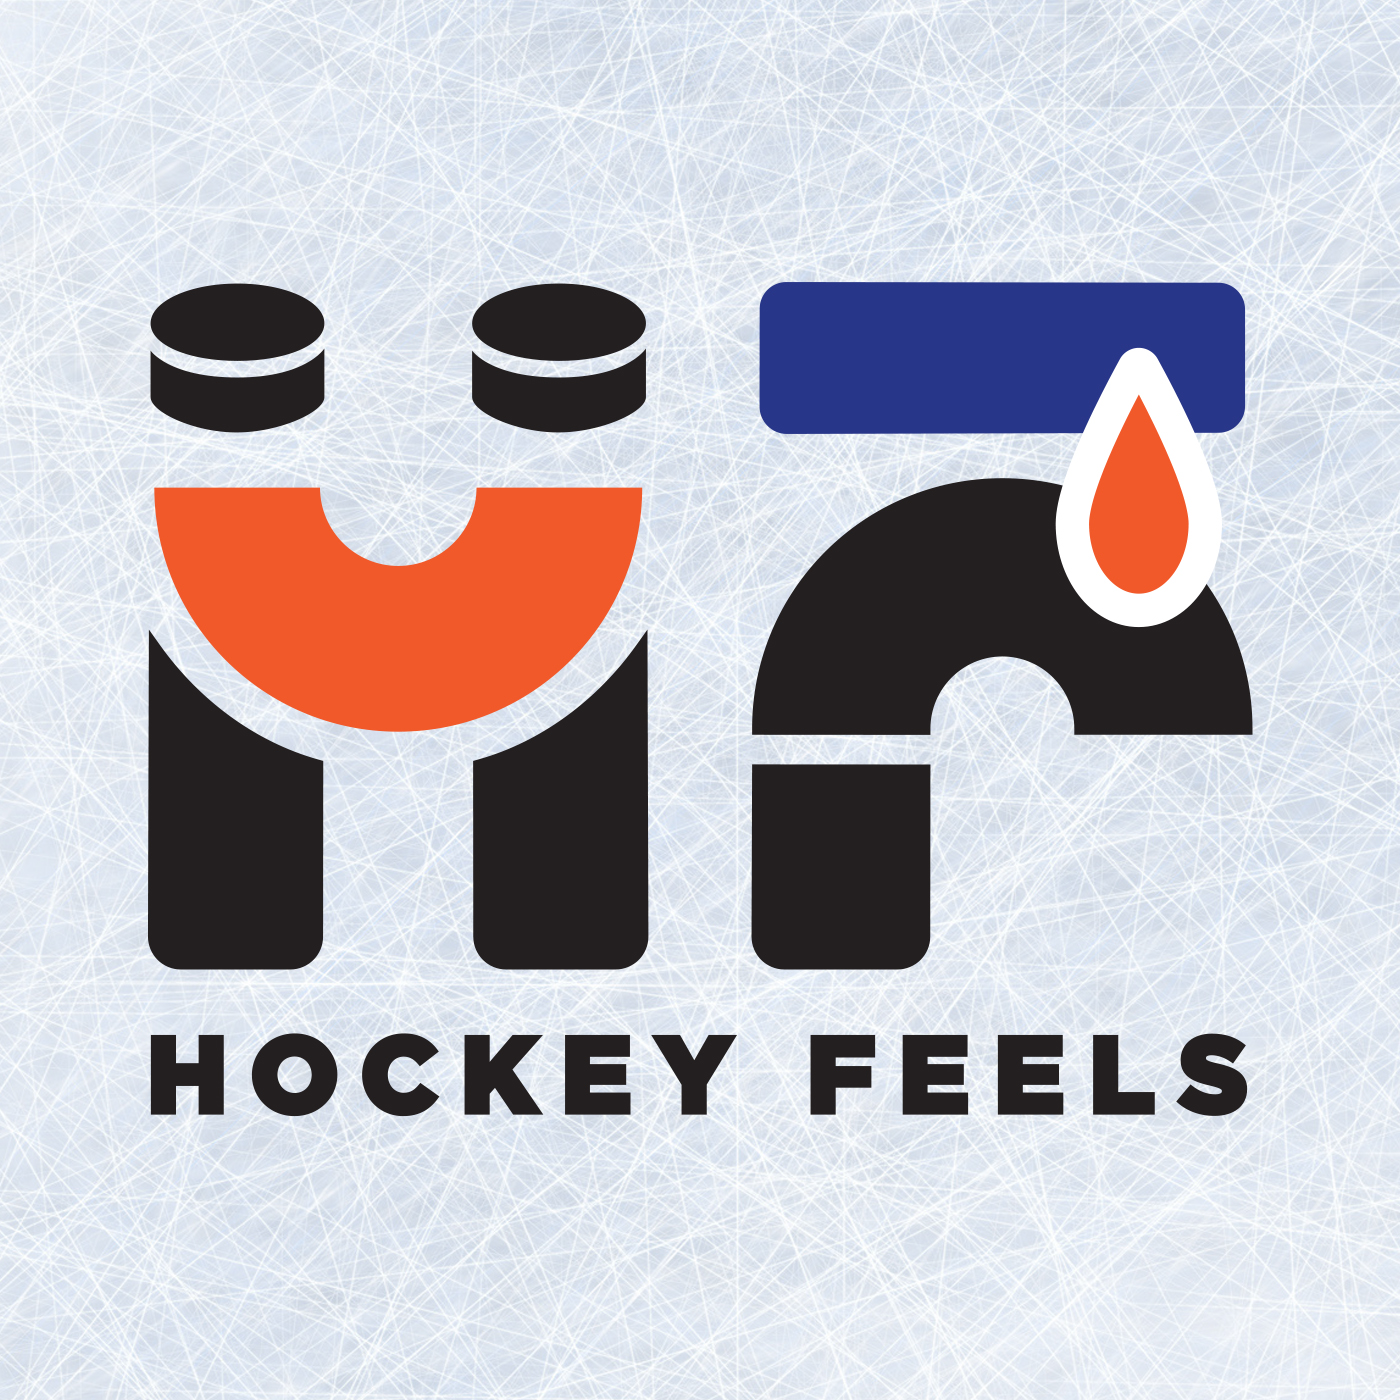 Hockey Feels – August 4, 2020